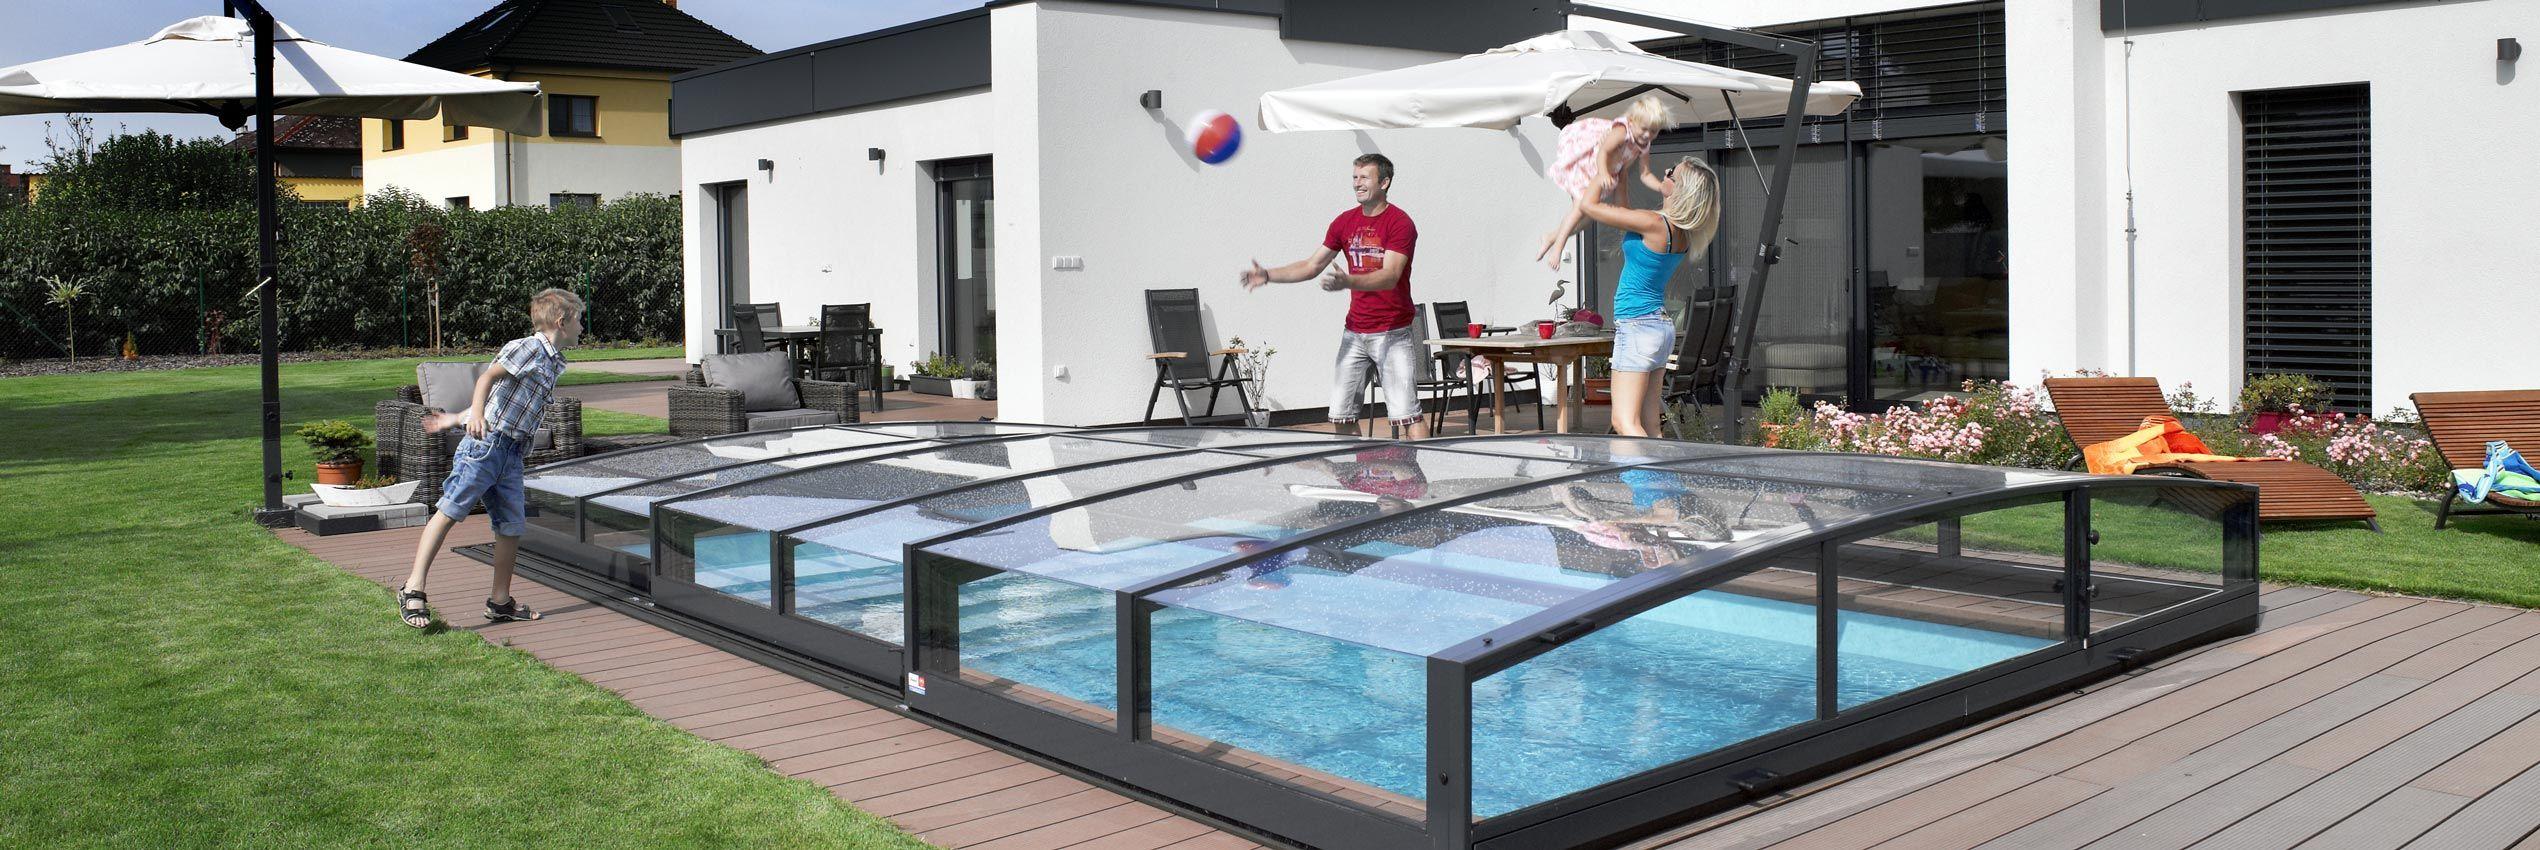 hero-pool-enclosure-viva-conkover-03